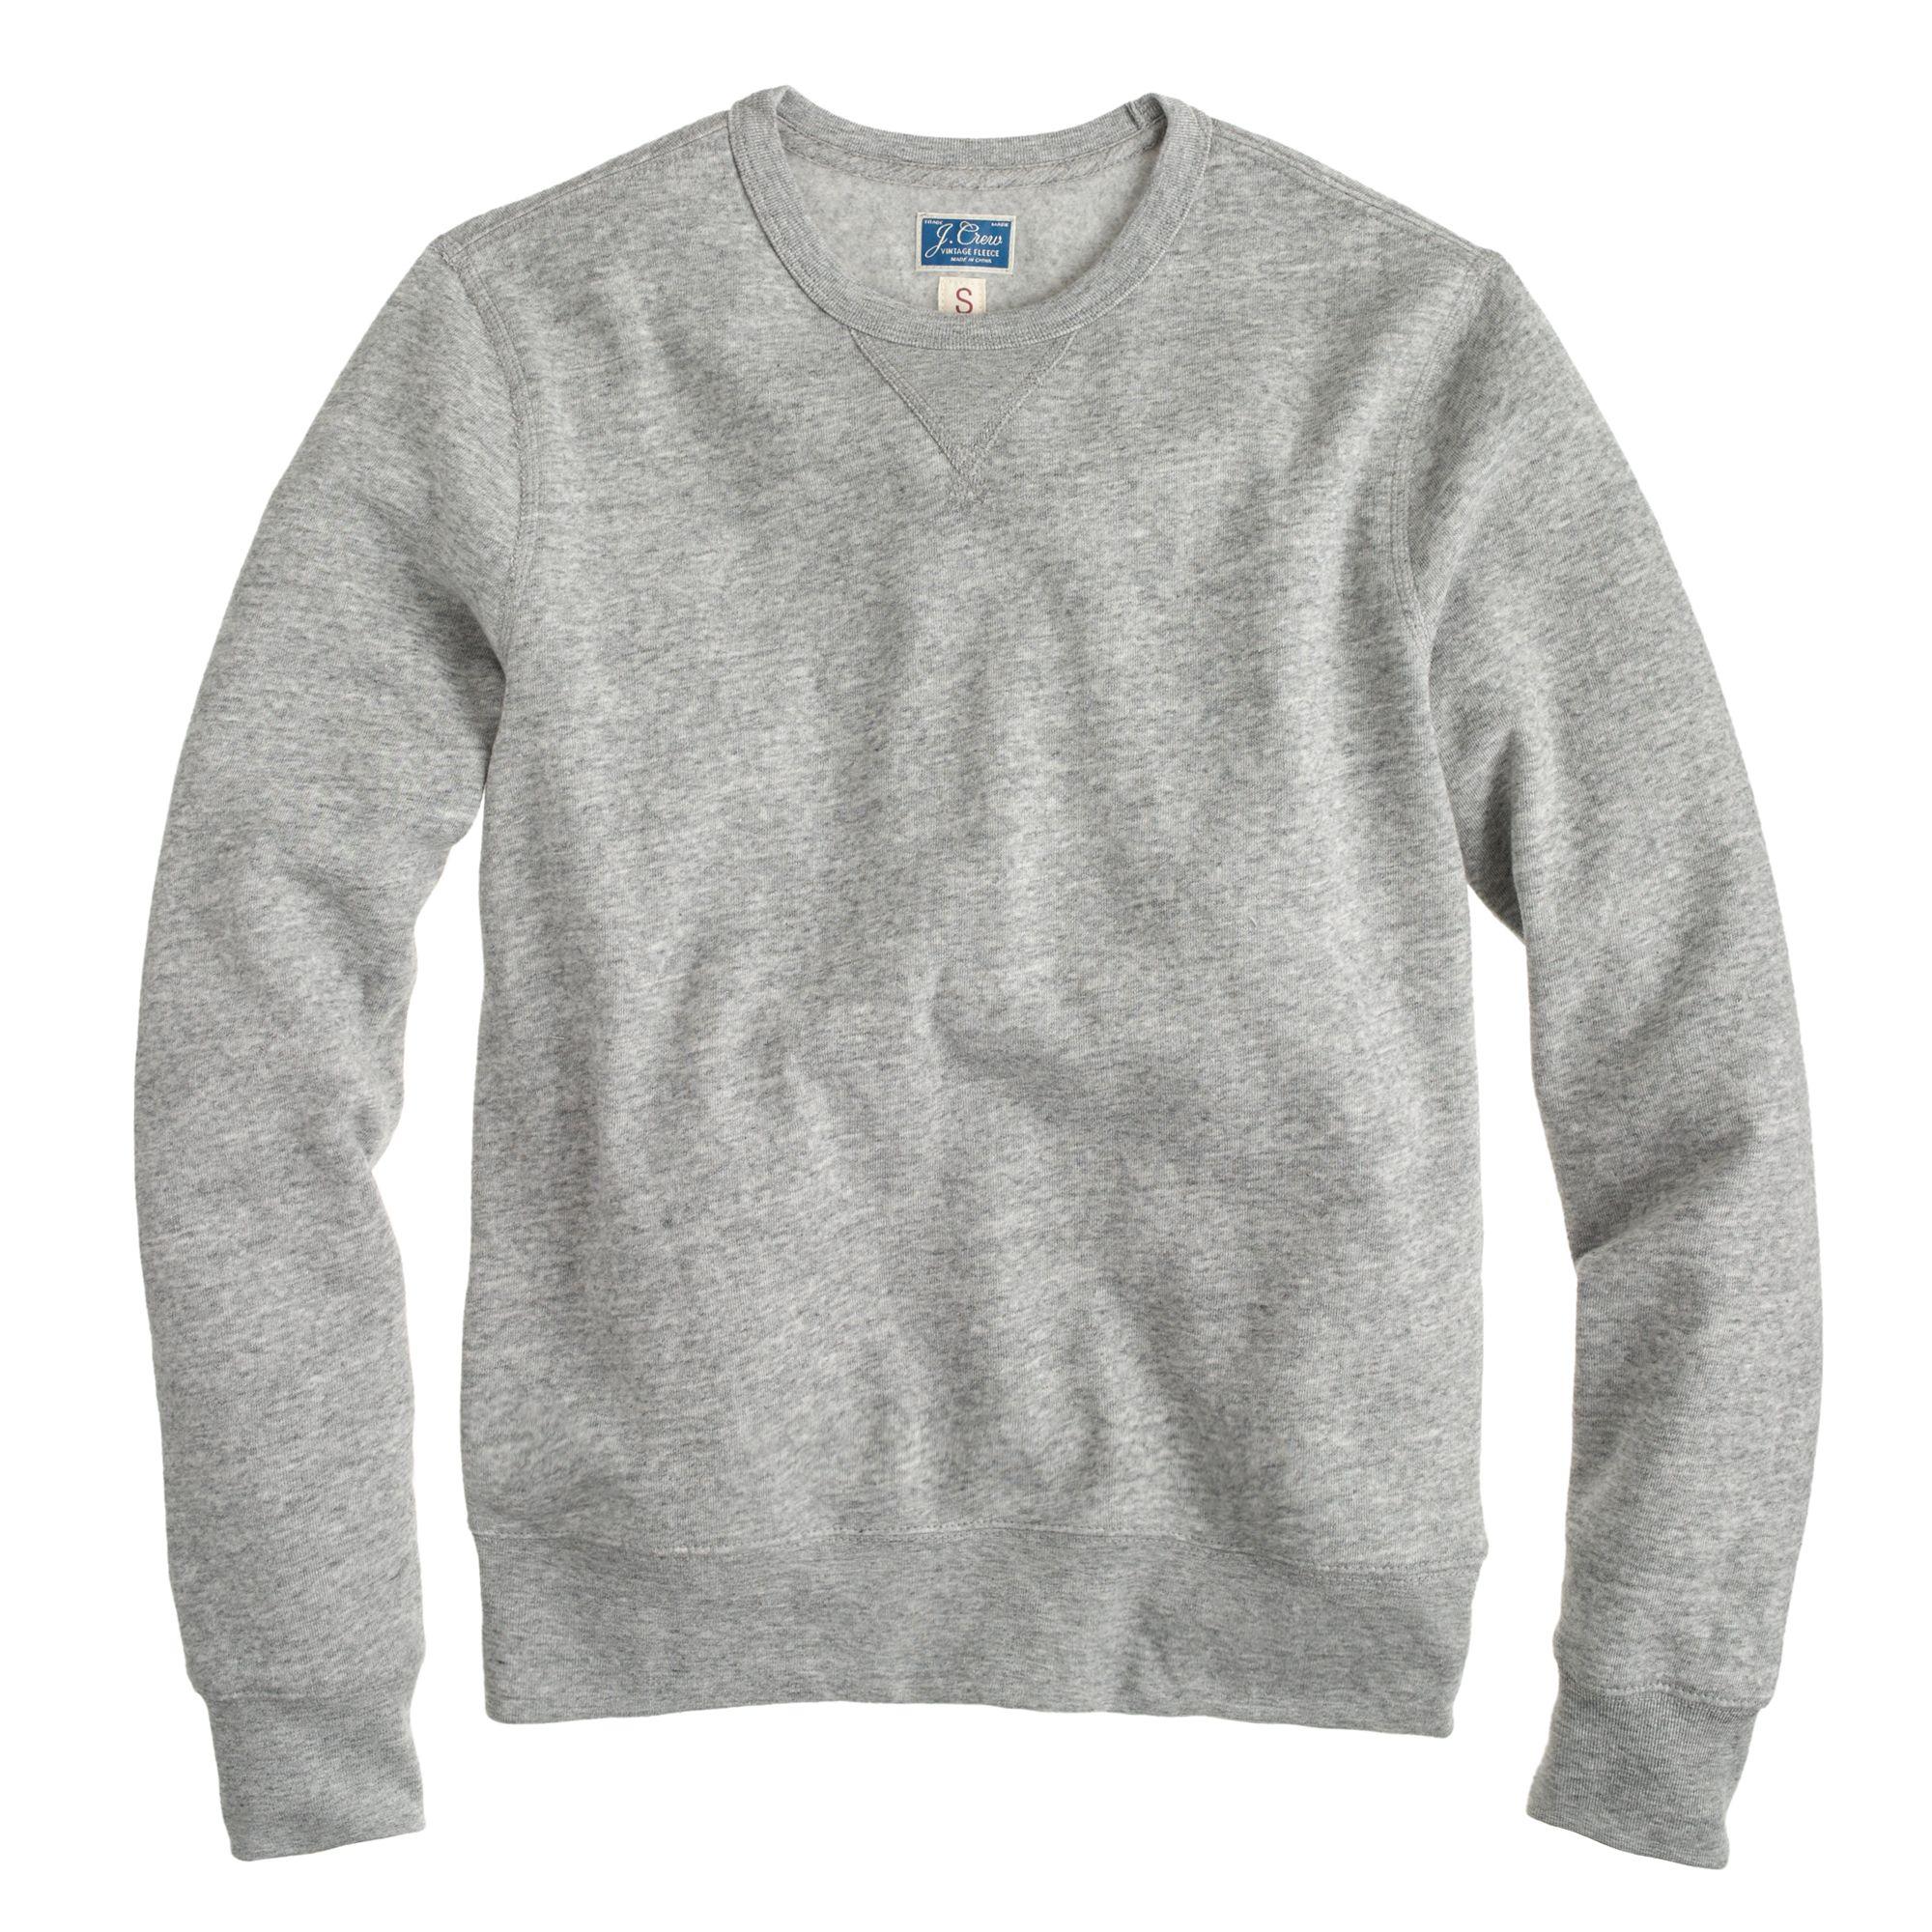 J.crew Preorder Slim Lightweight Crewneck Sweatshirt in Gray for ...